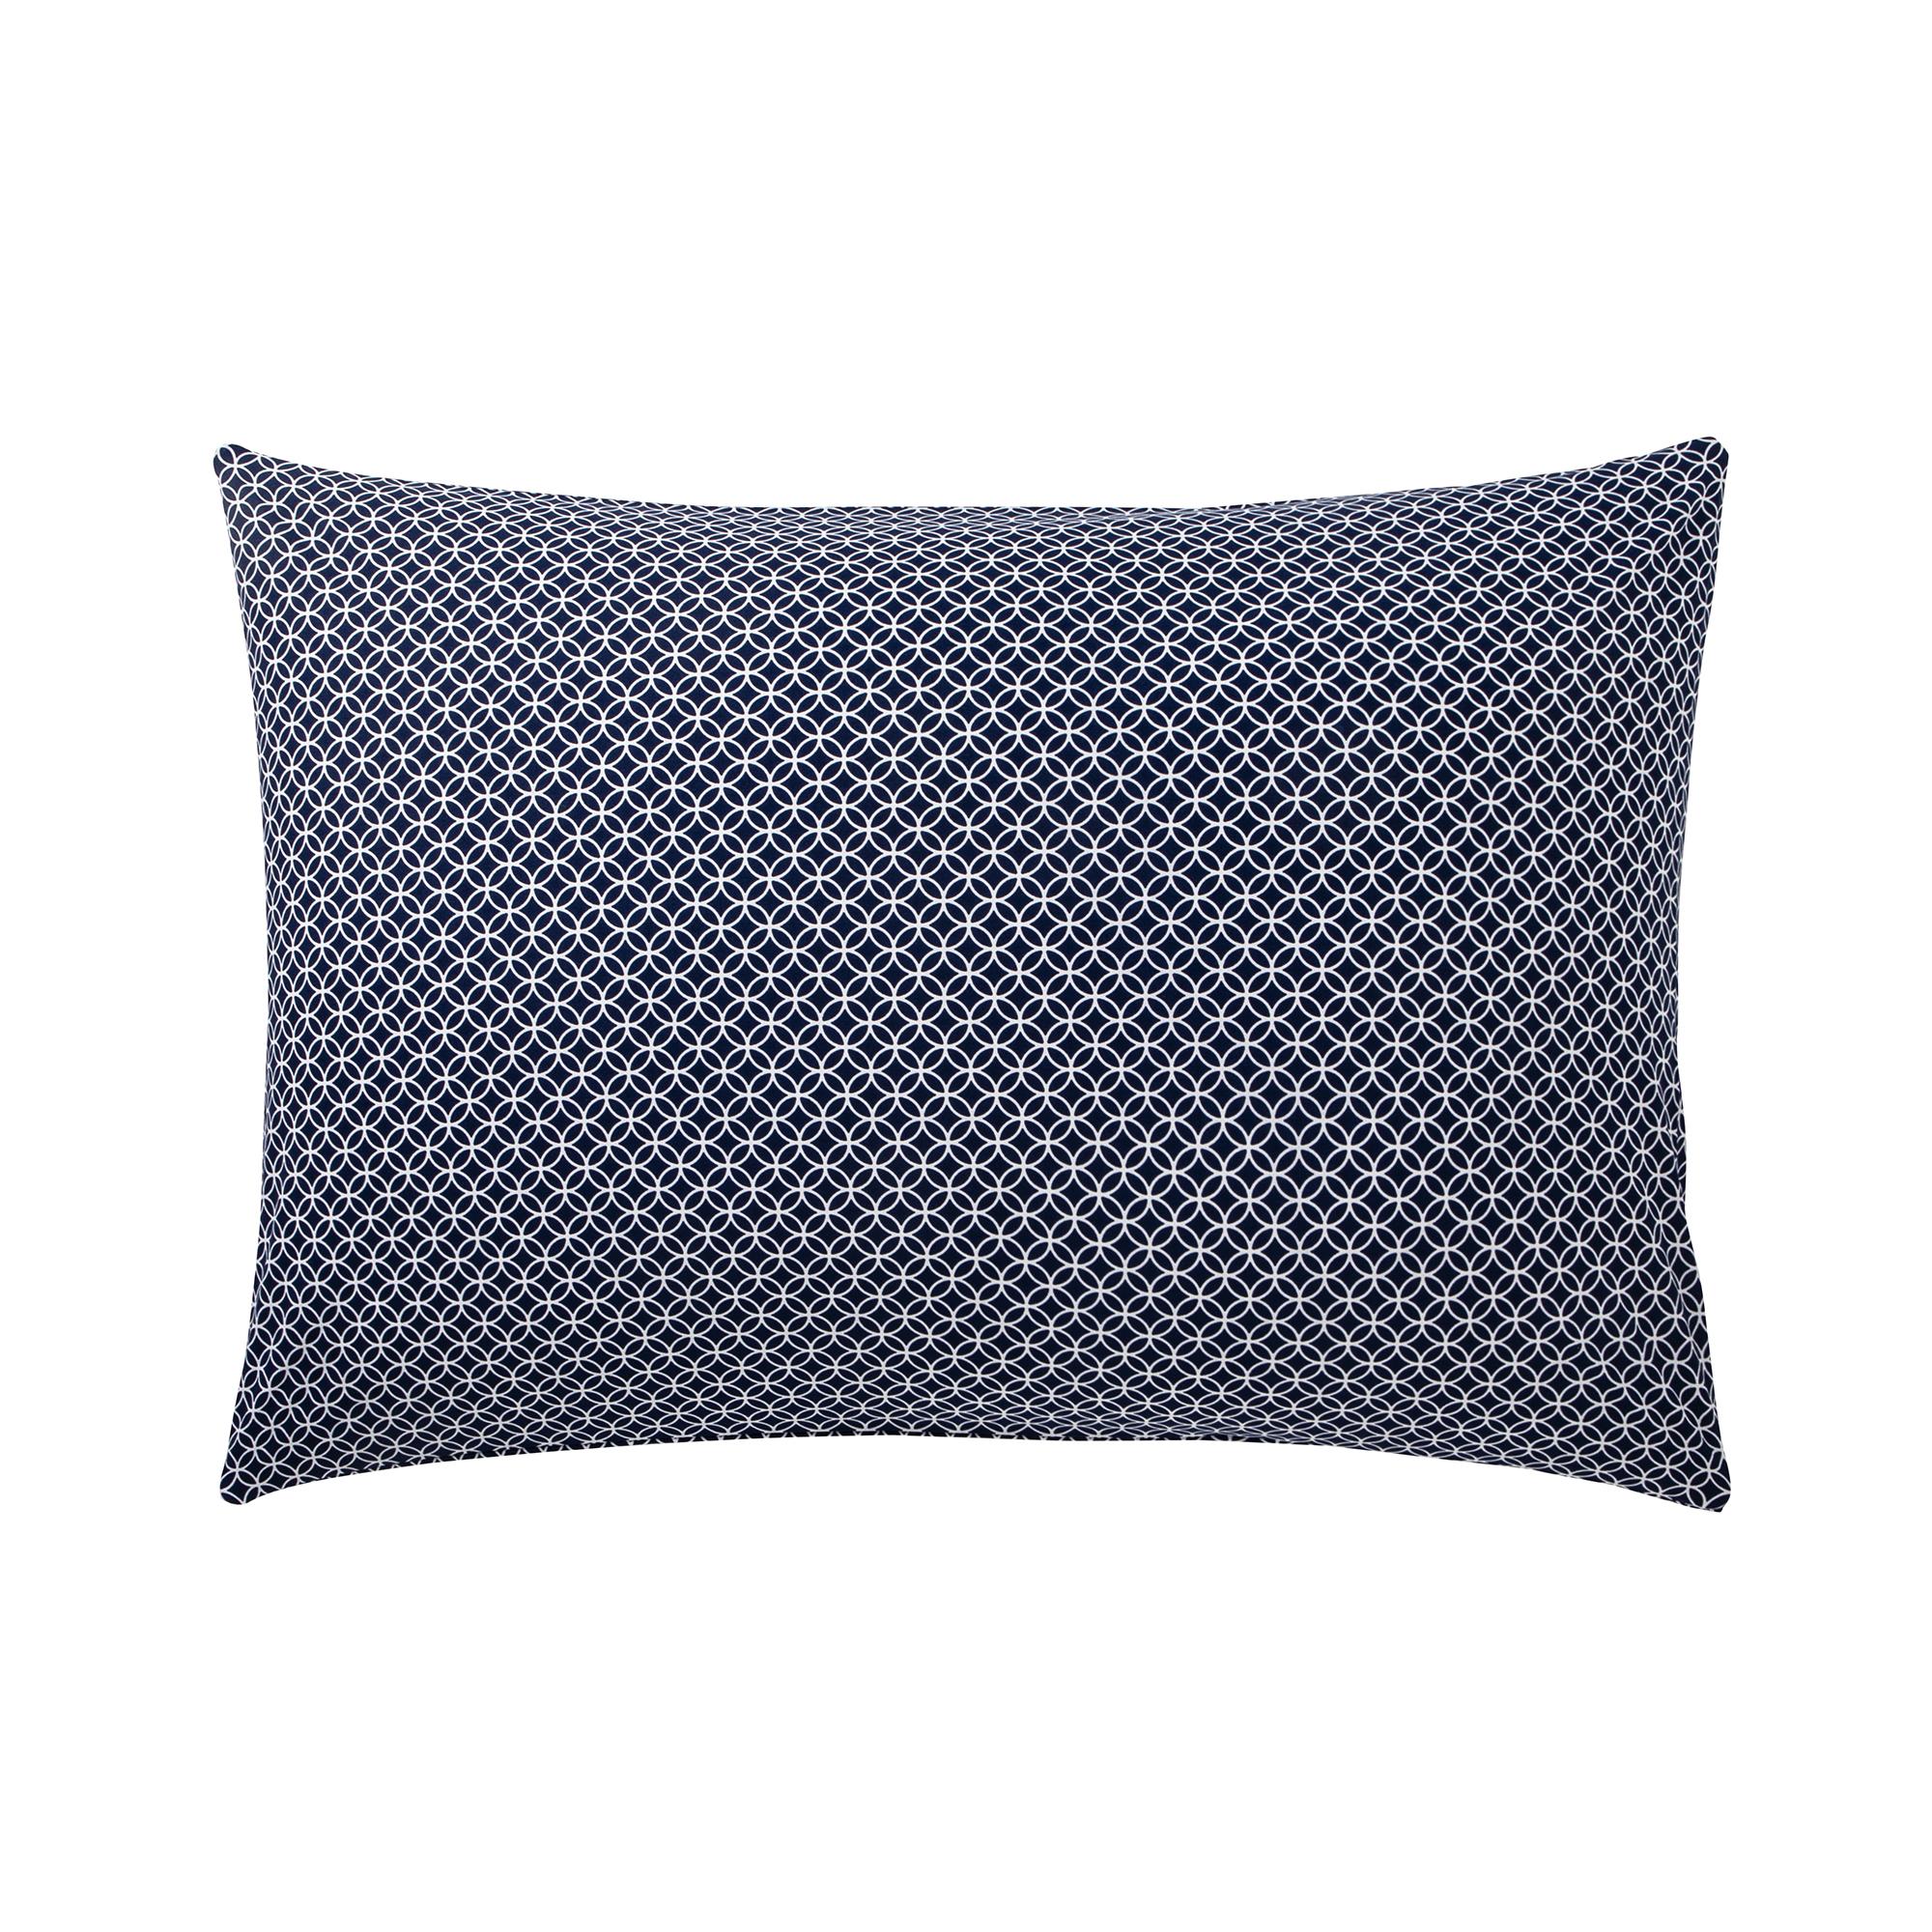 CLAUDIA - Taie d'oreiller bleu en bambou bleu 50 x 70